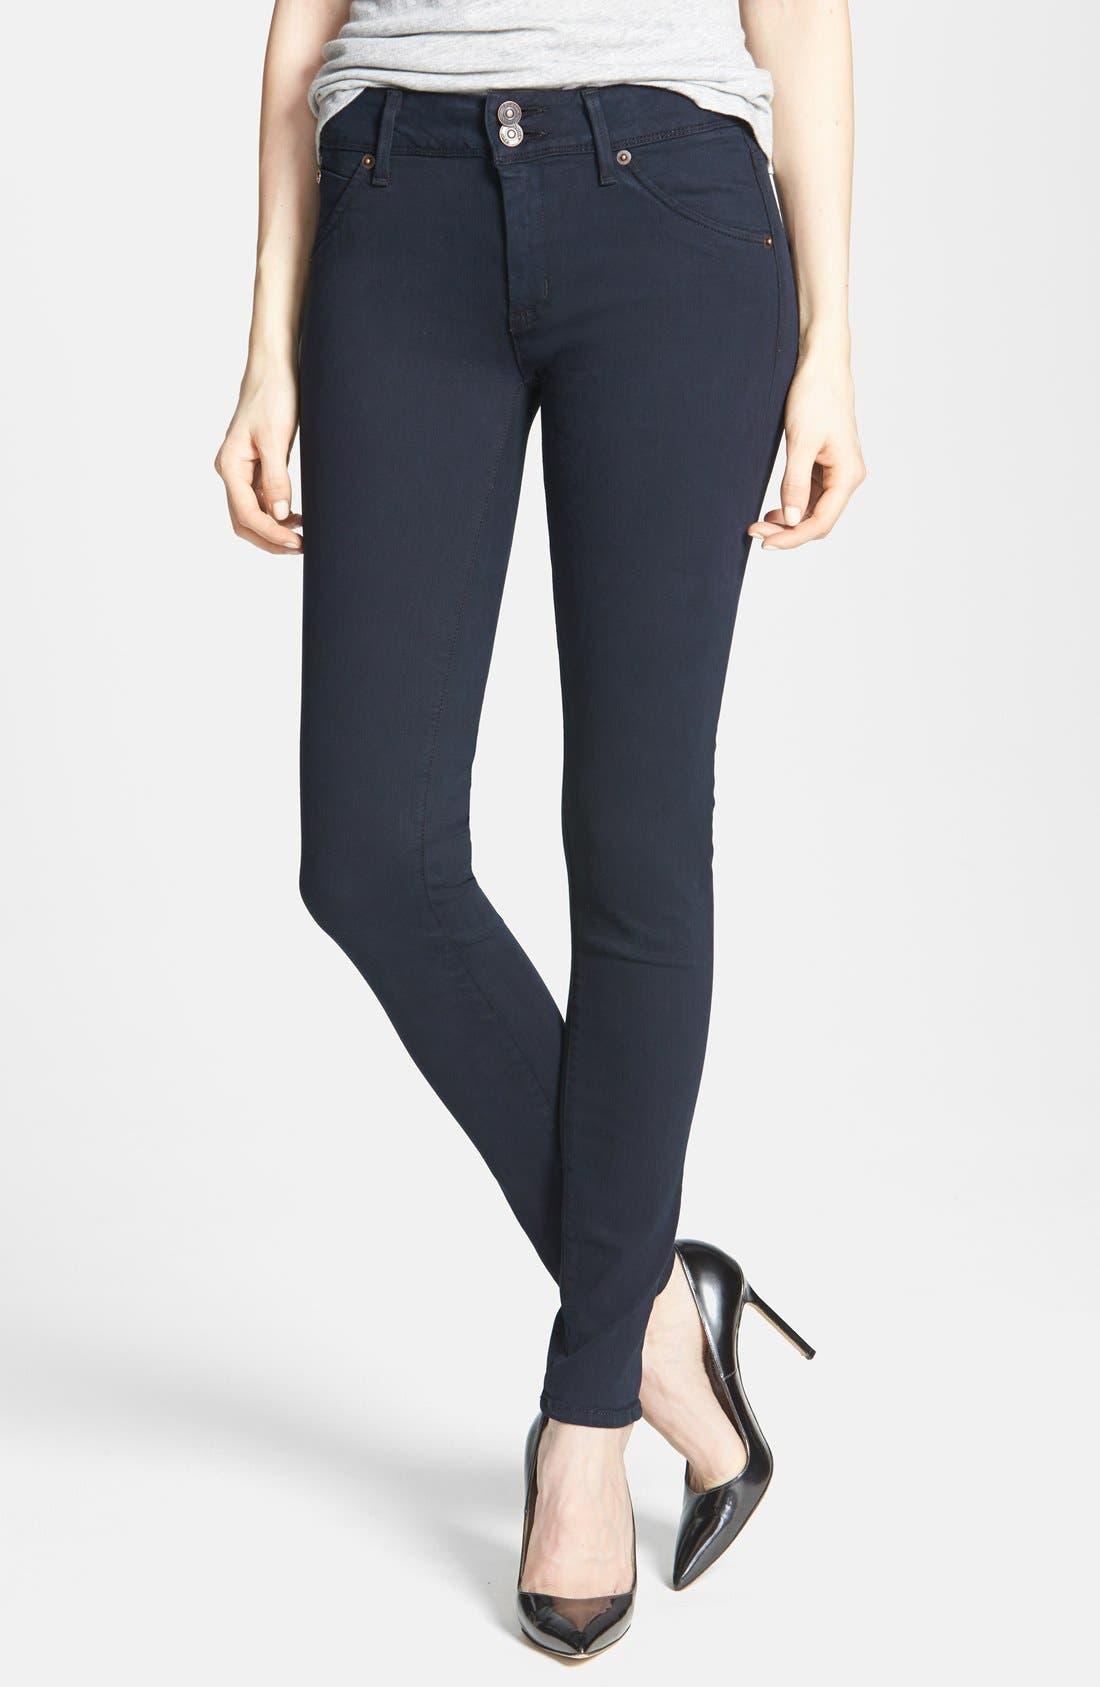 Alternate Image 1 Selected - Hudson Jeans 'Collin' Skinny Stretch Jeans (Black Iris)